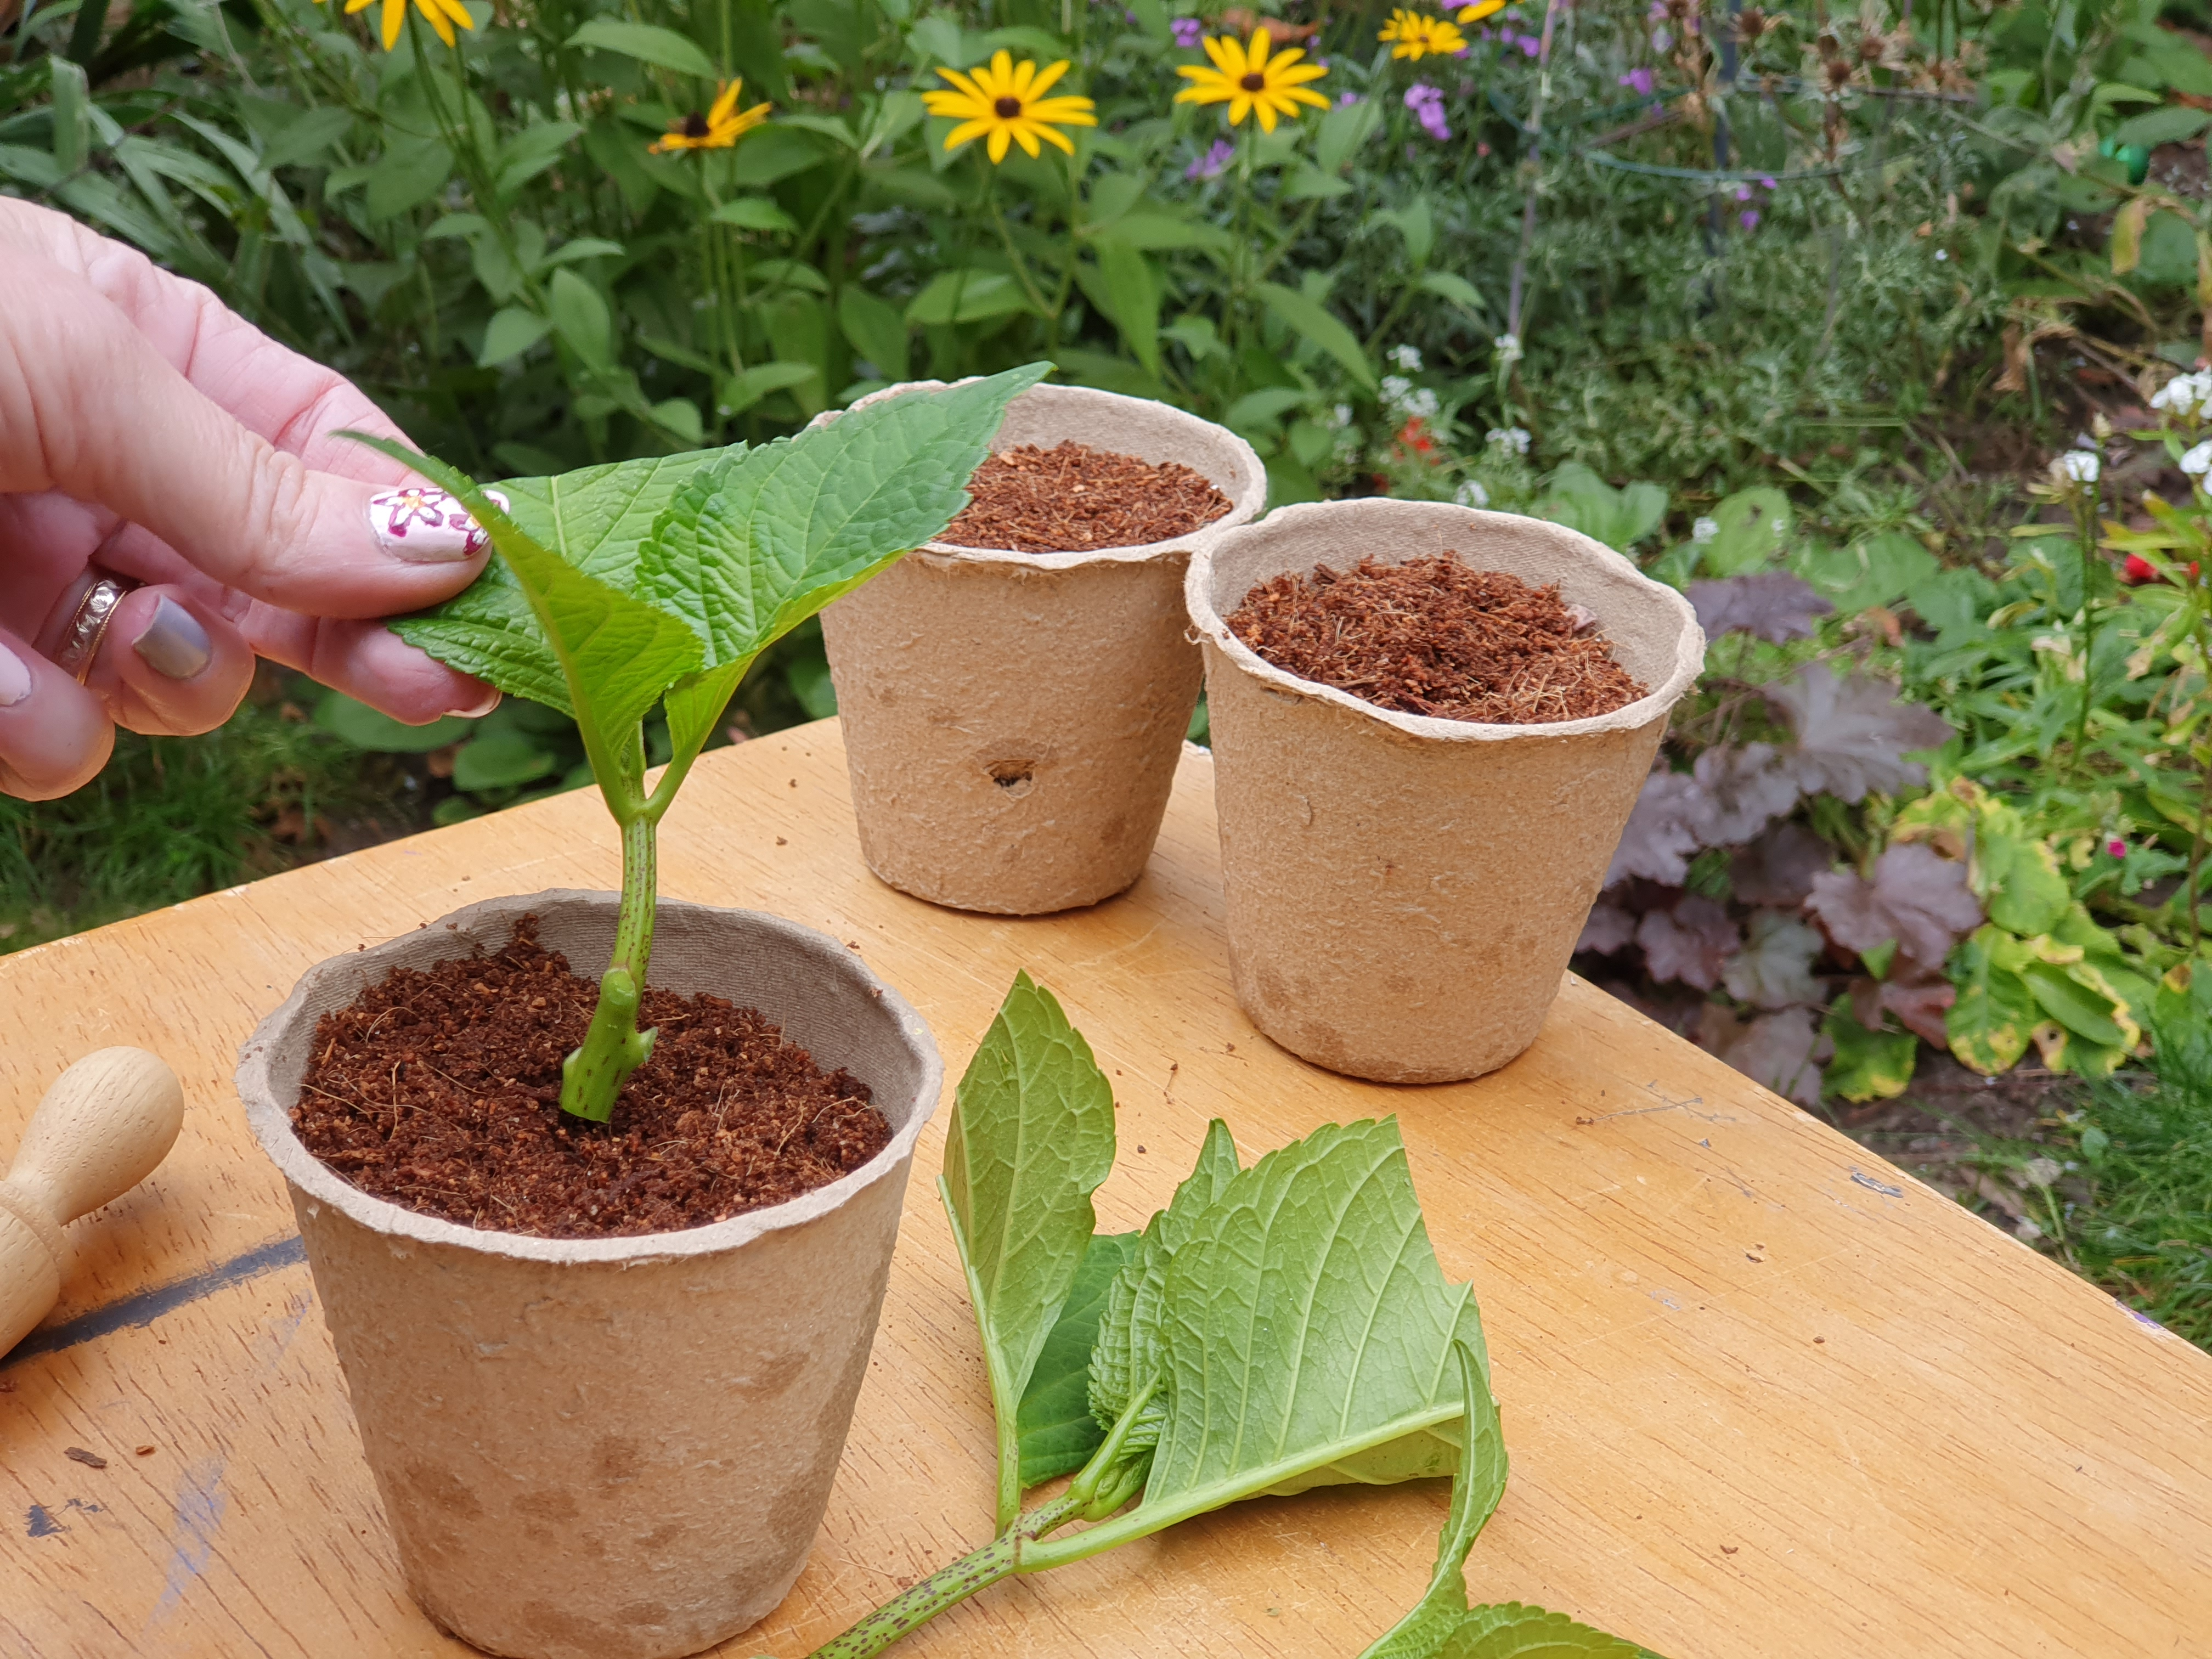 Insert hydrangea cutting into biodegradable pot of coir compost